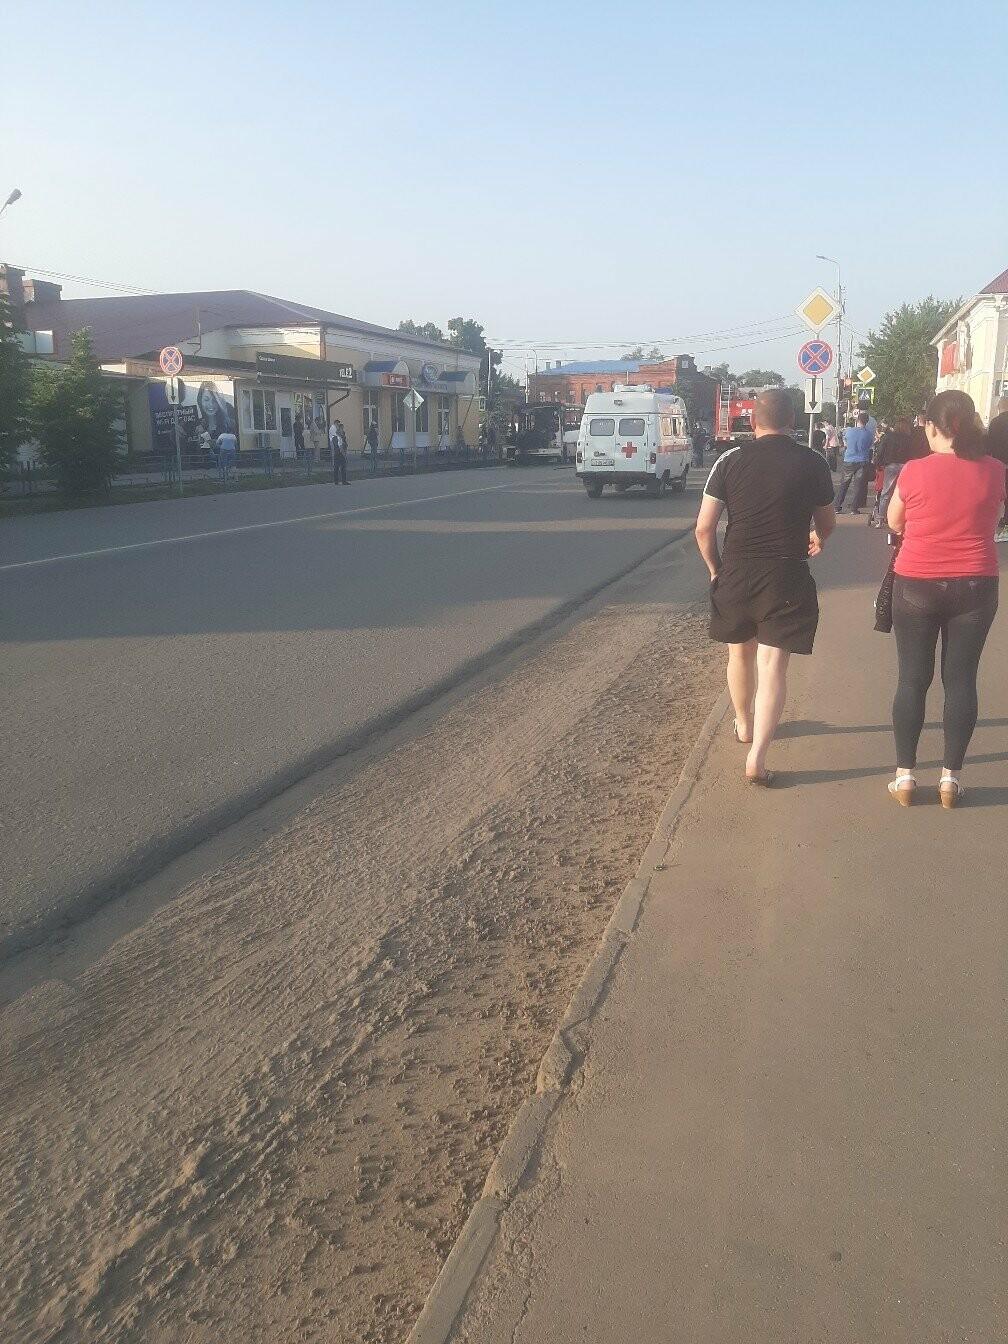 В Моршанске загорелся автобус с пассажирами. ВИДЕО, фото-3